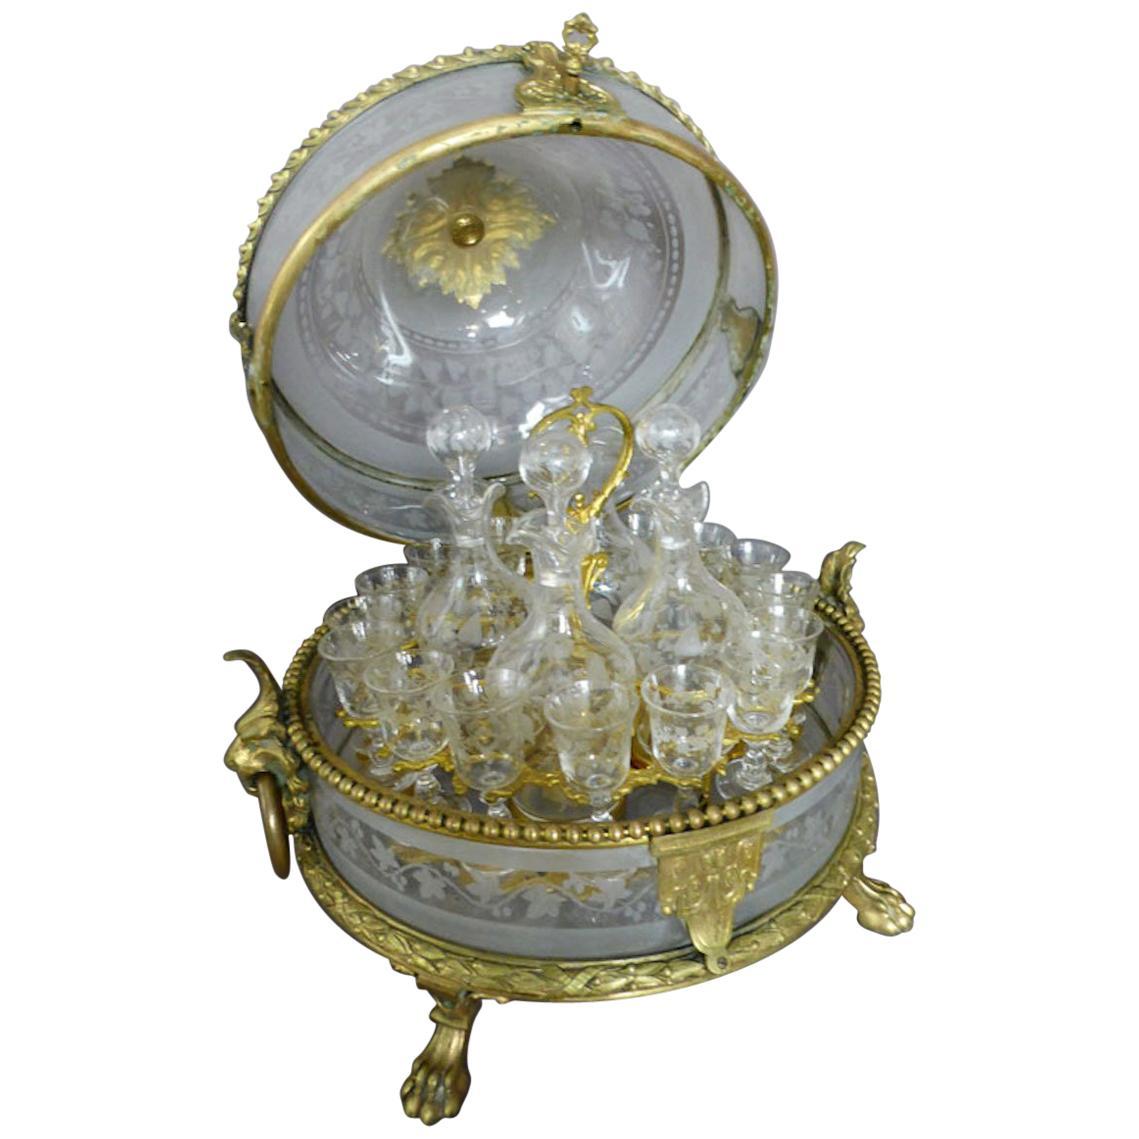 19th century Napoleon III Period Crystal and Bronze Liquor Cellar